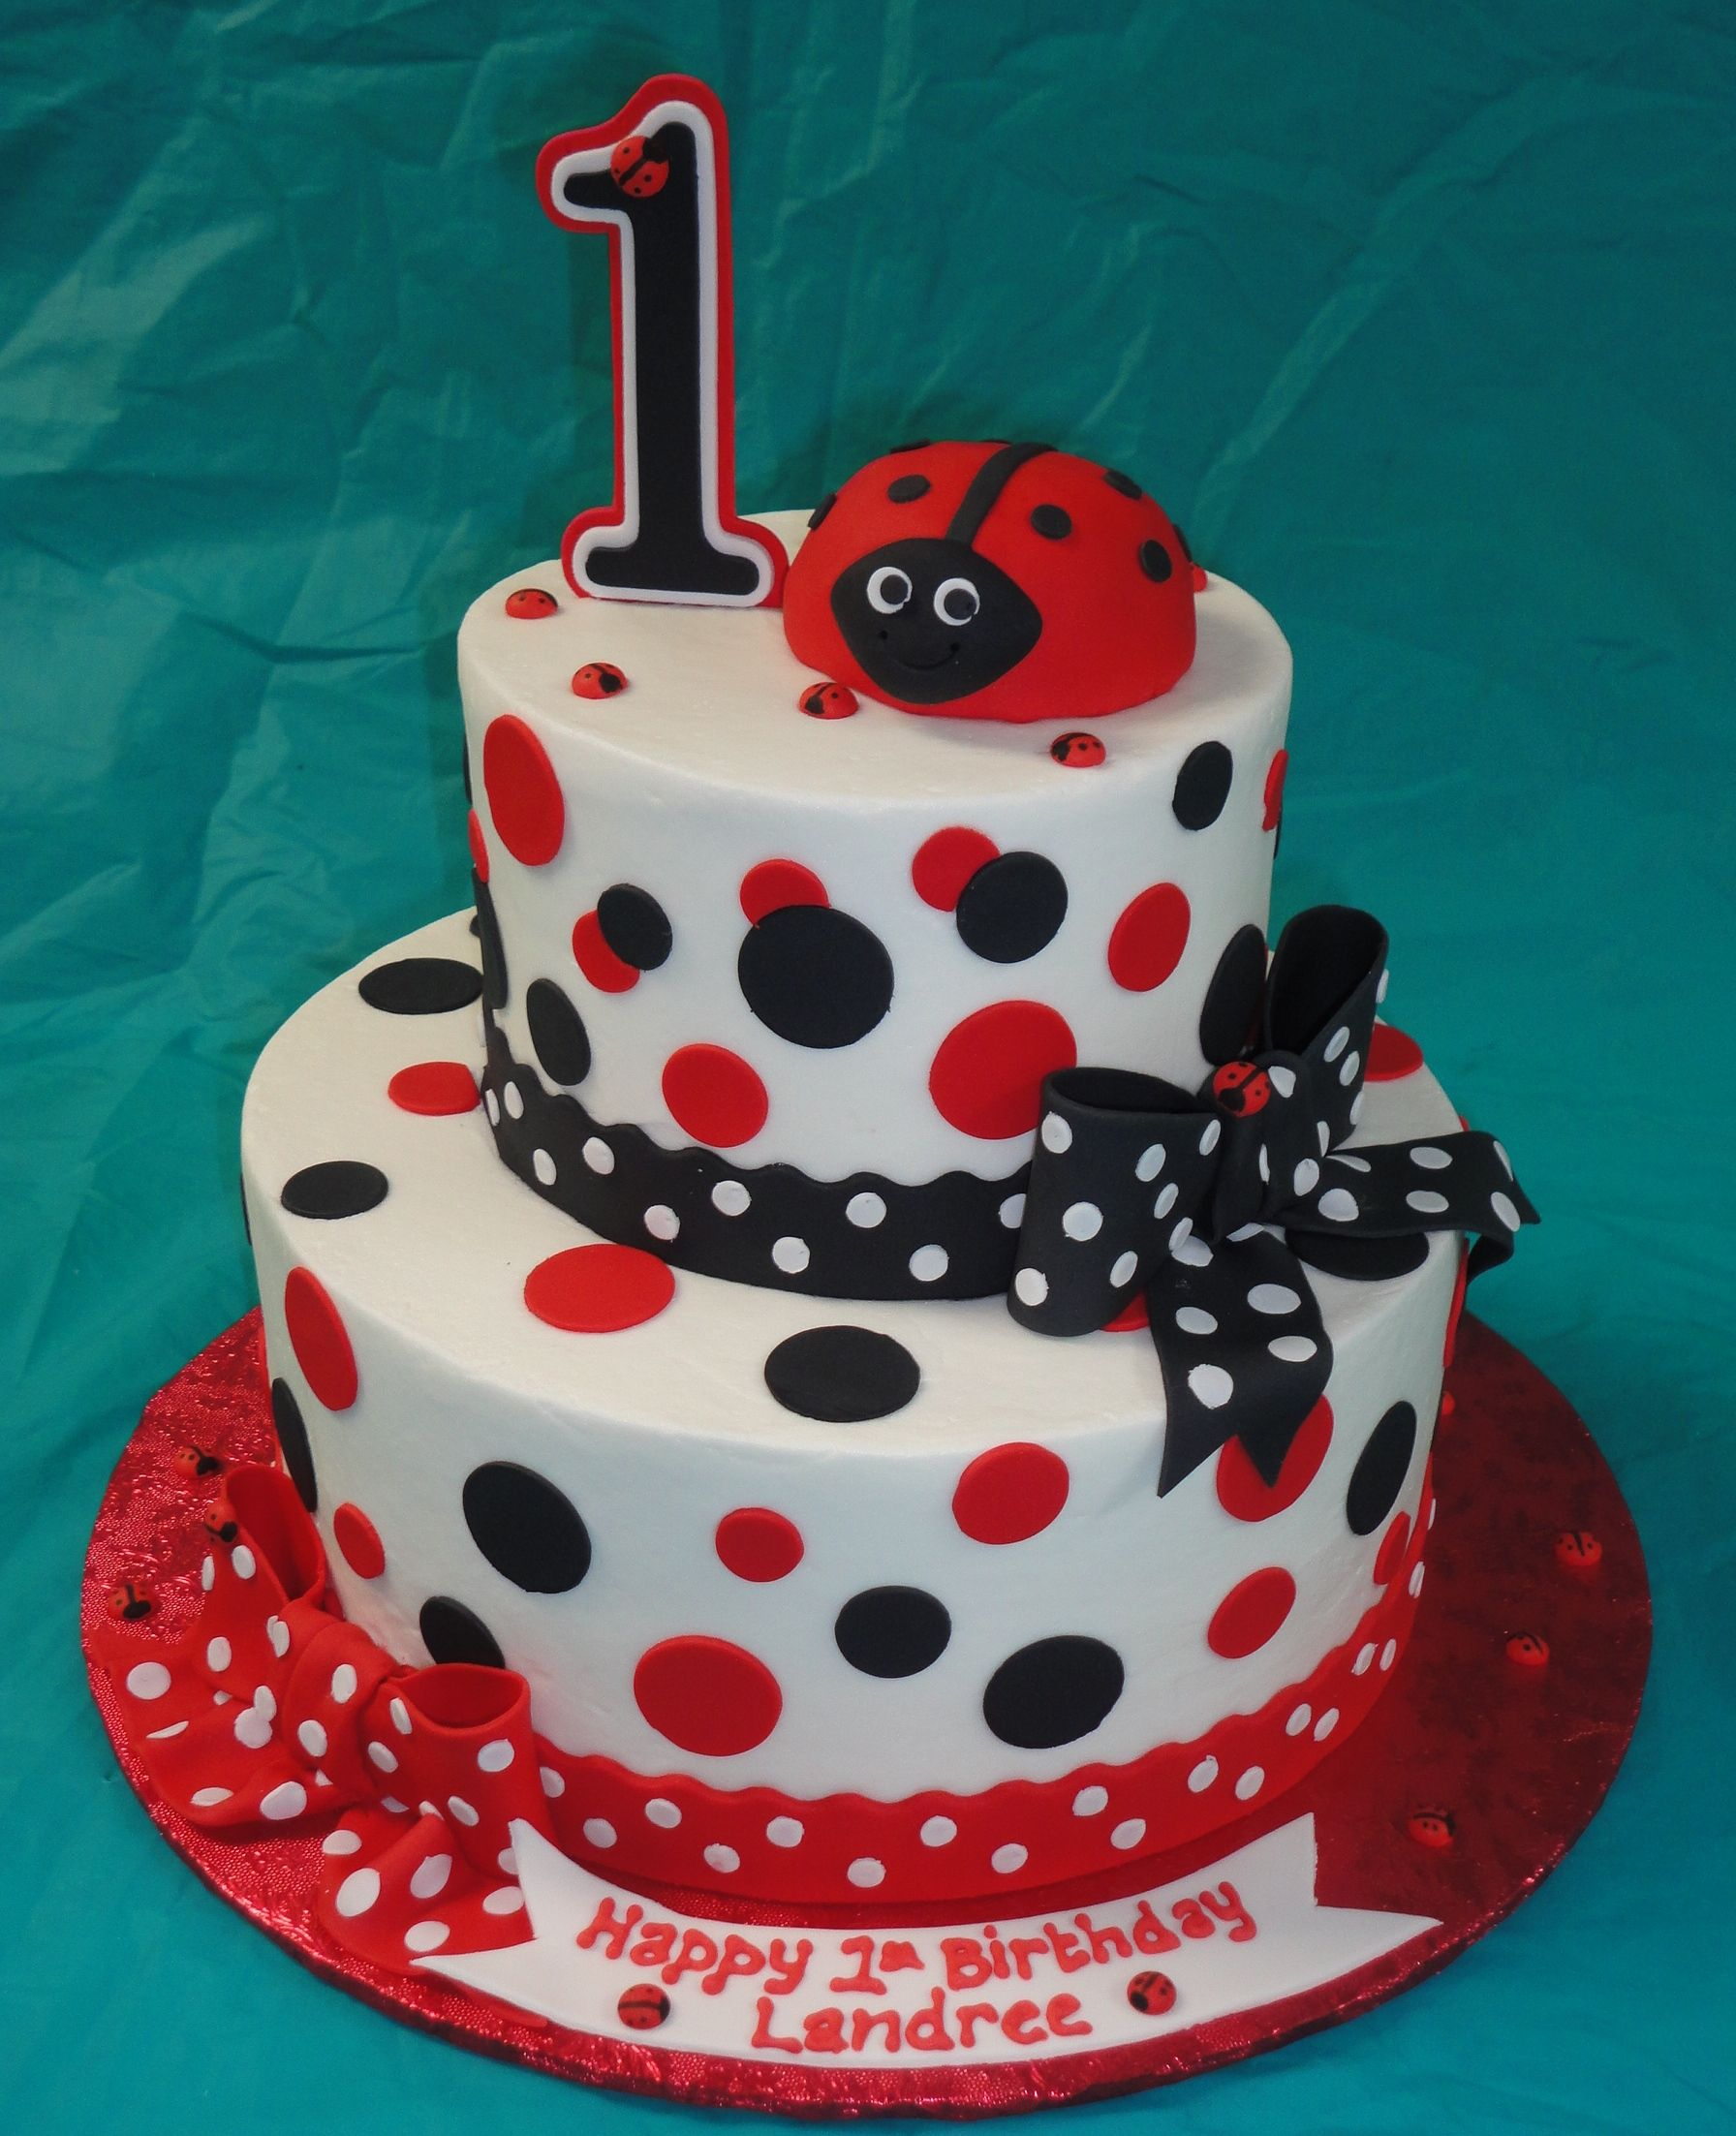 Swell Ladybug Birhtday Cakes Ladybug Cakes Decoration Ideas Funny Birthday Cards Online Aeocydamsfinfo